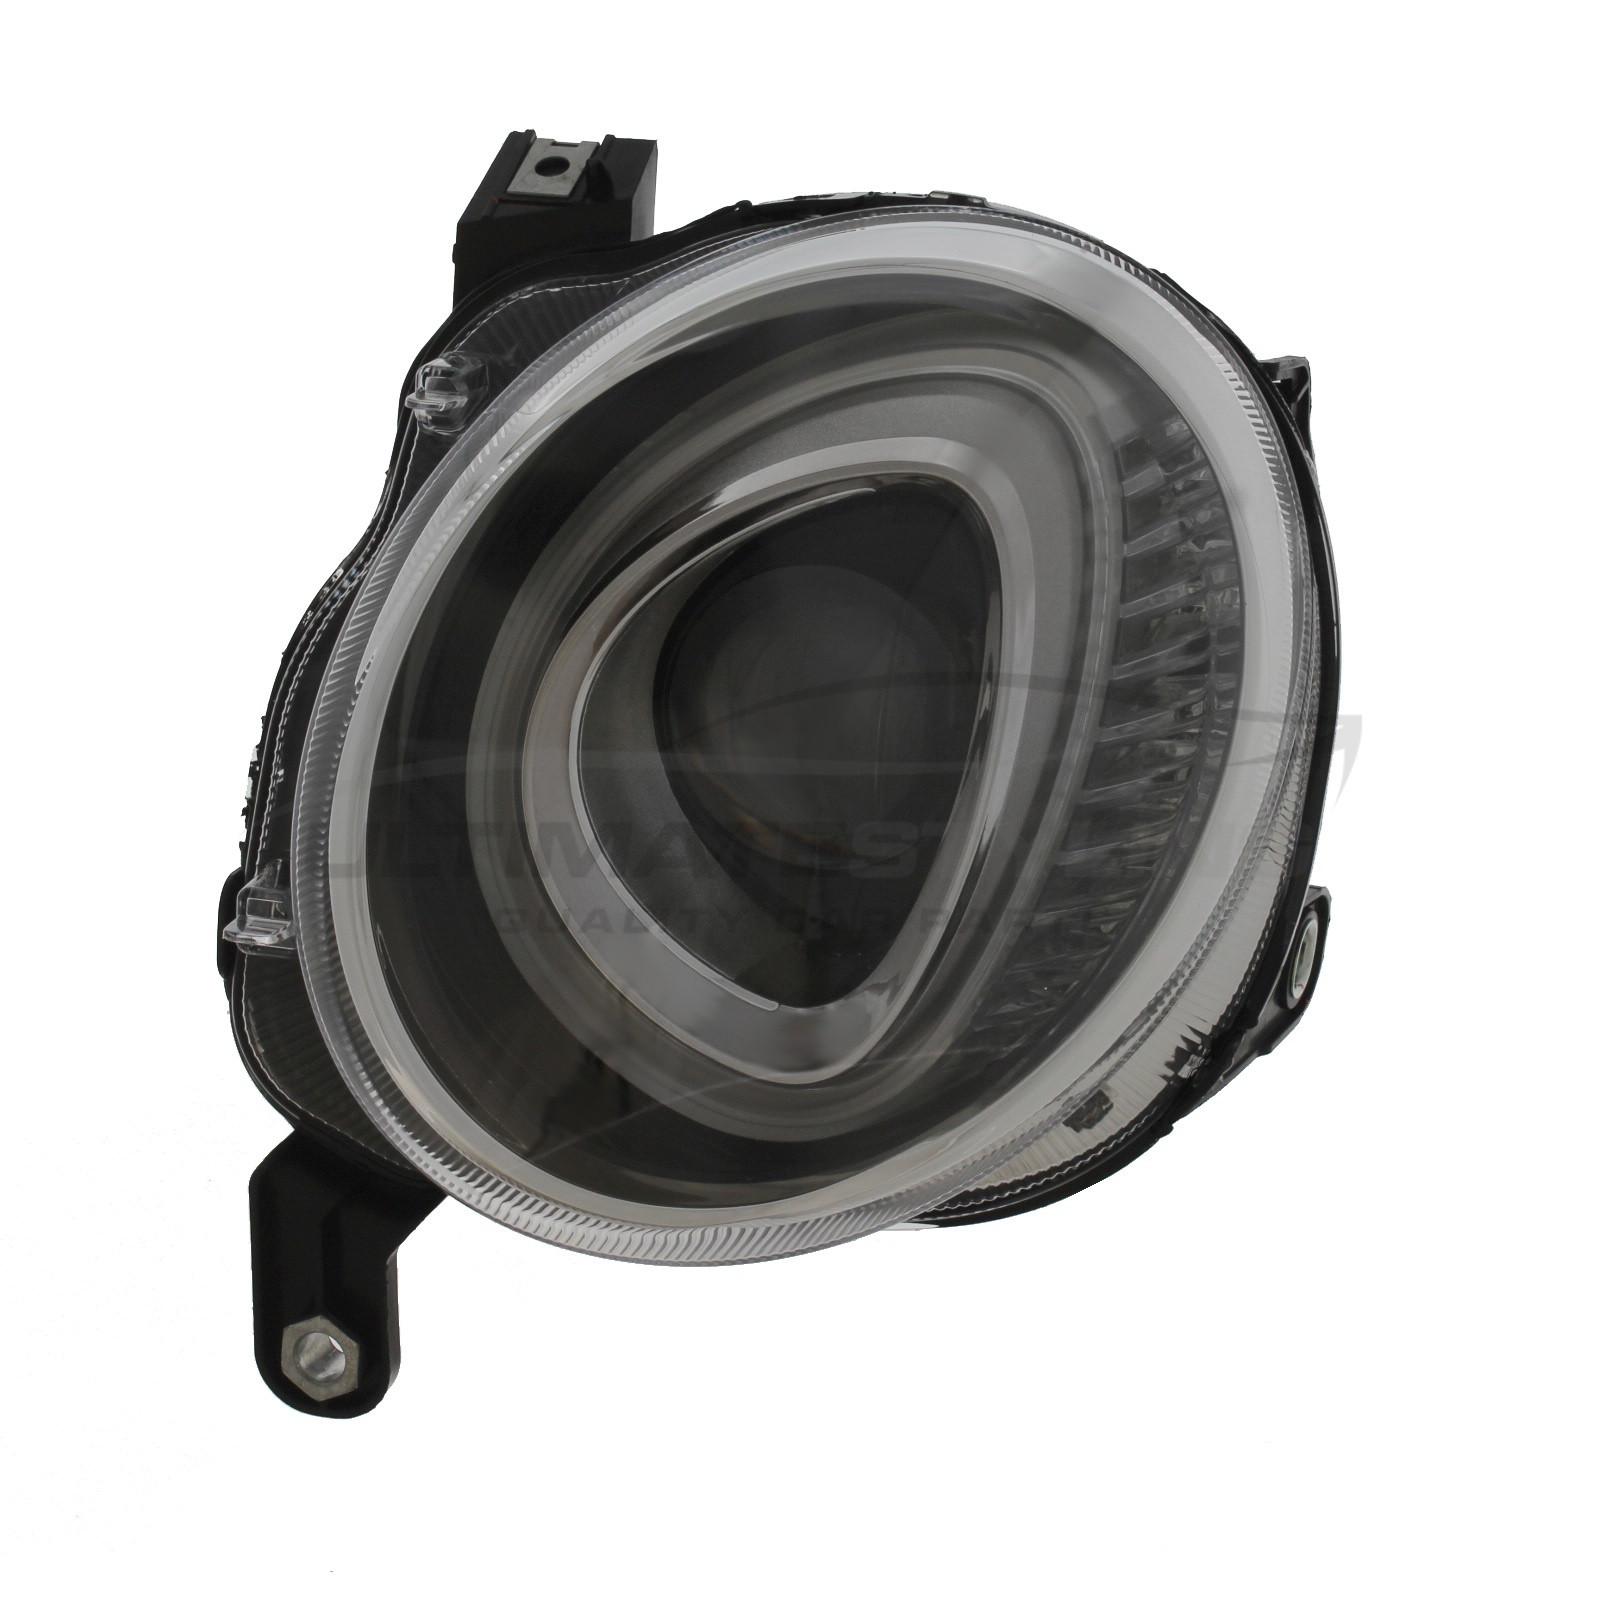 Abarth 500 / 595 / 695, Fiat 500 Headlight / Headlamp - Dipped Beam - Drivers Side (RH) - Halogen